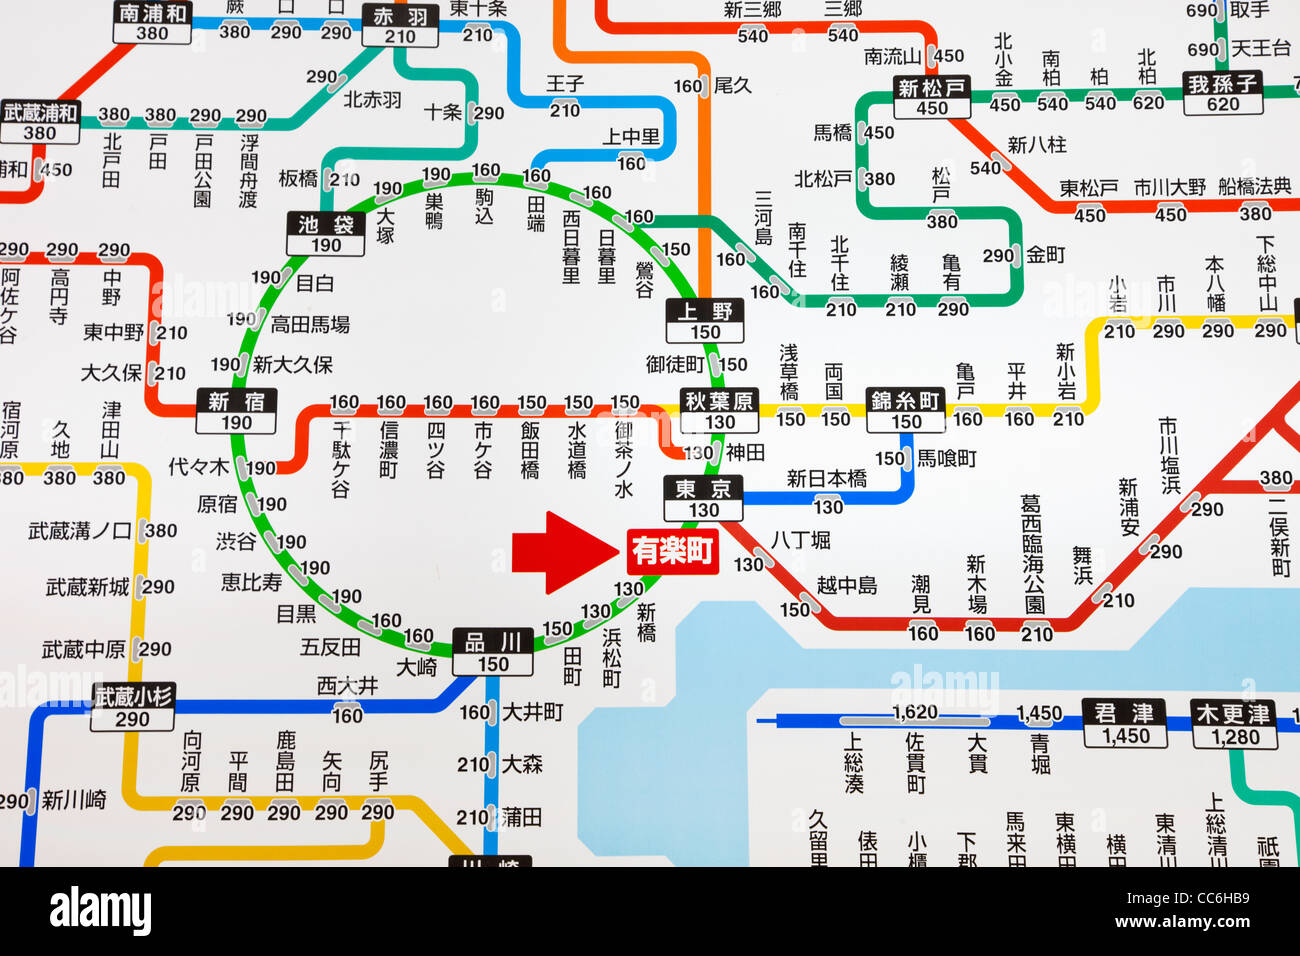 Tokyo Jr Map Japan, Tokyo, Tokyo JR (Japan Railways) Train System Map Stock